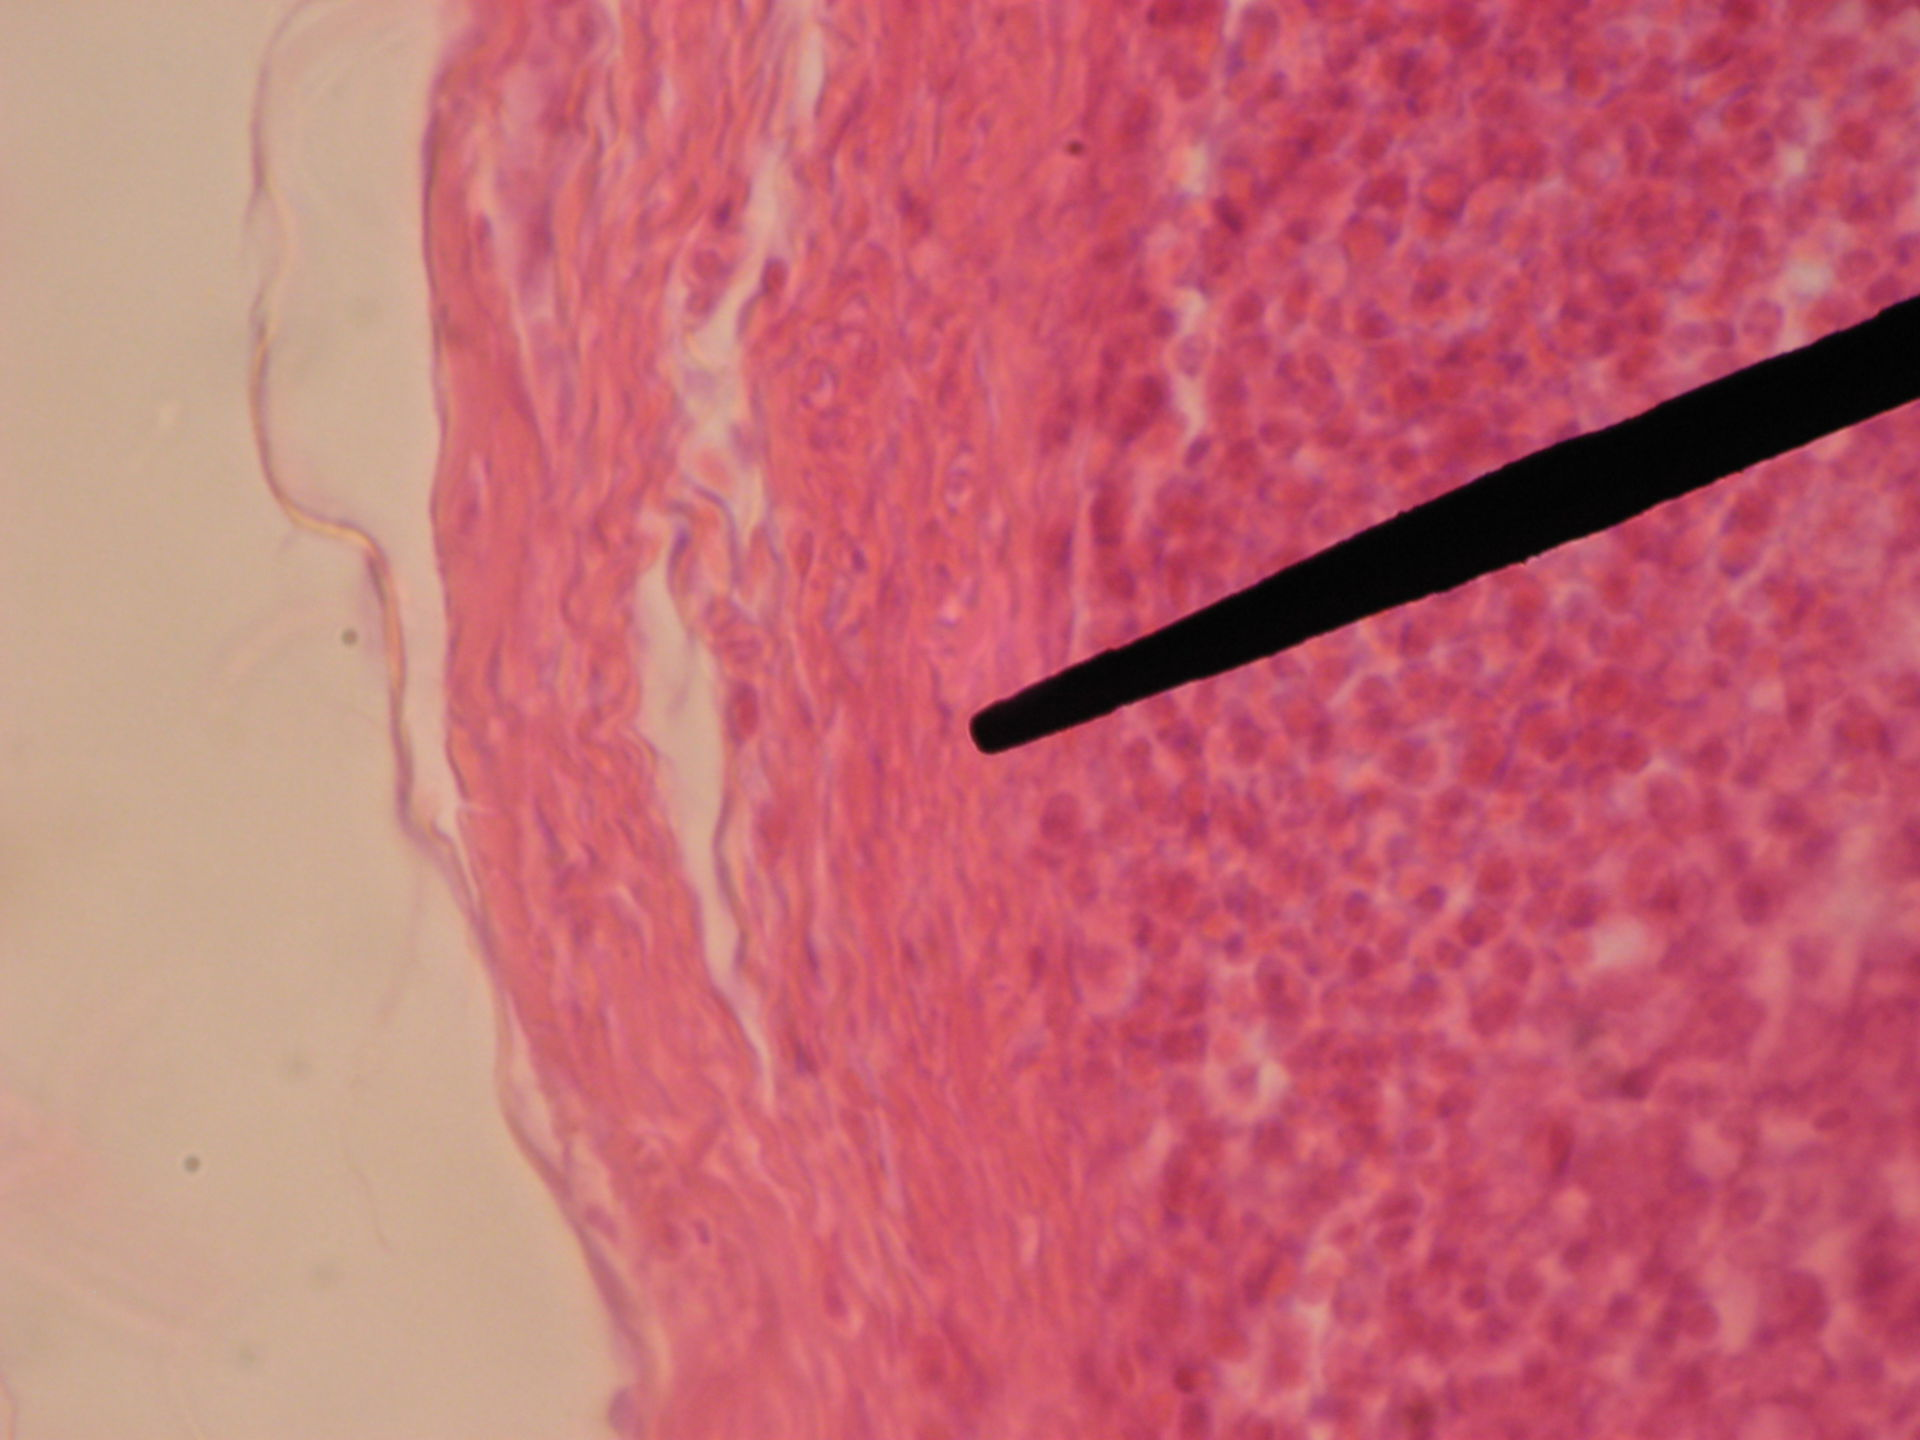 Lymphknoten des Rindes - Bindegewebskapsel